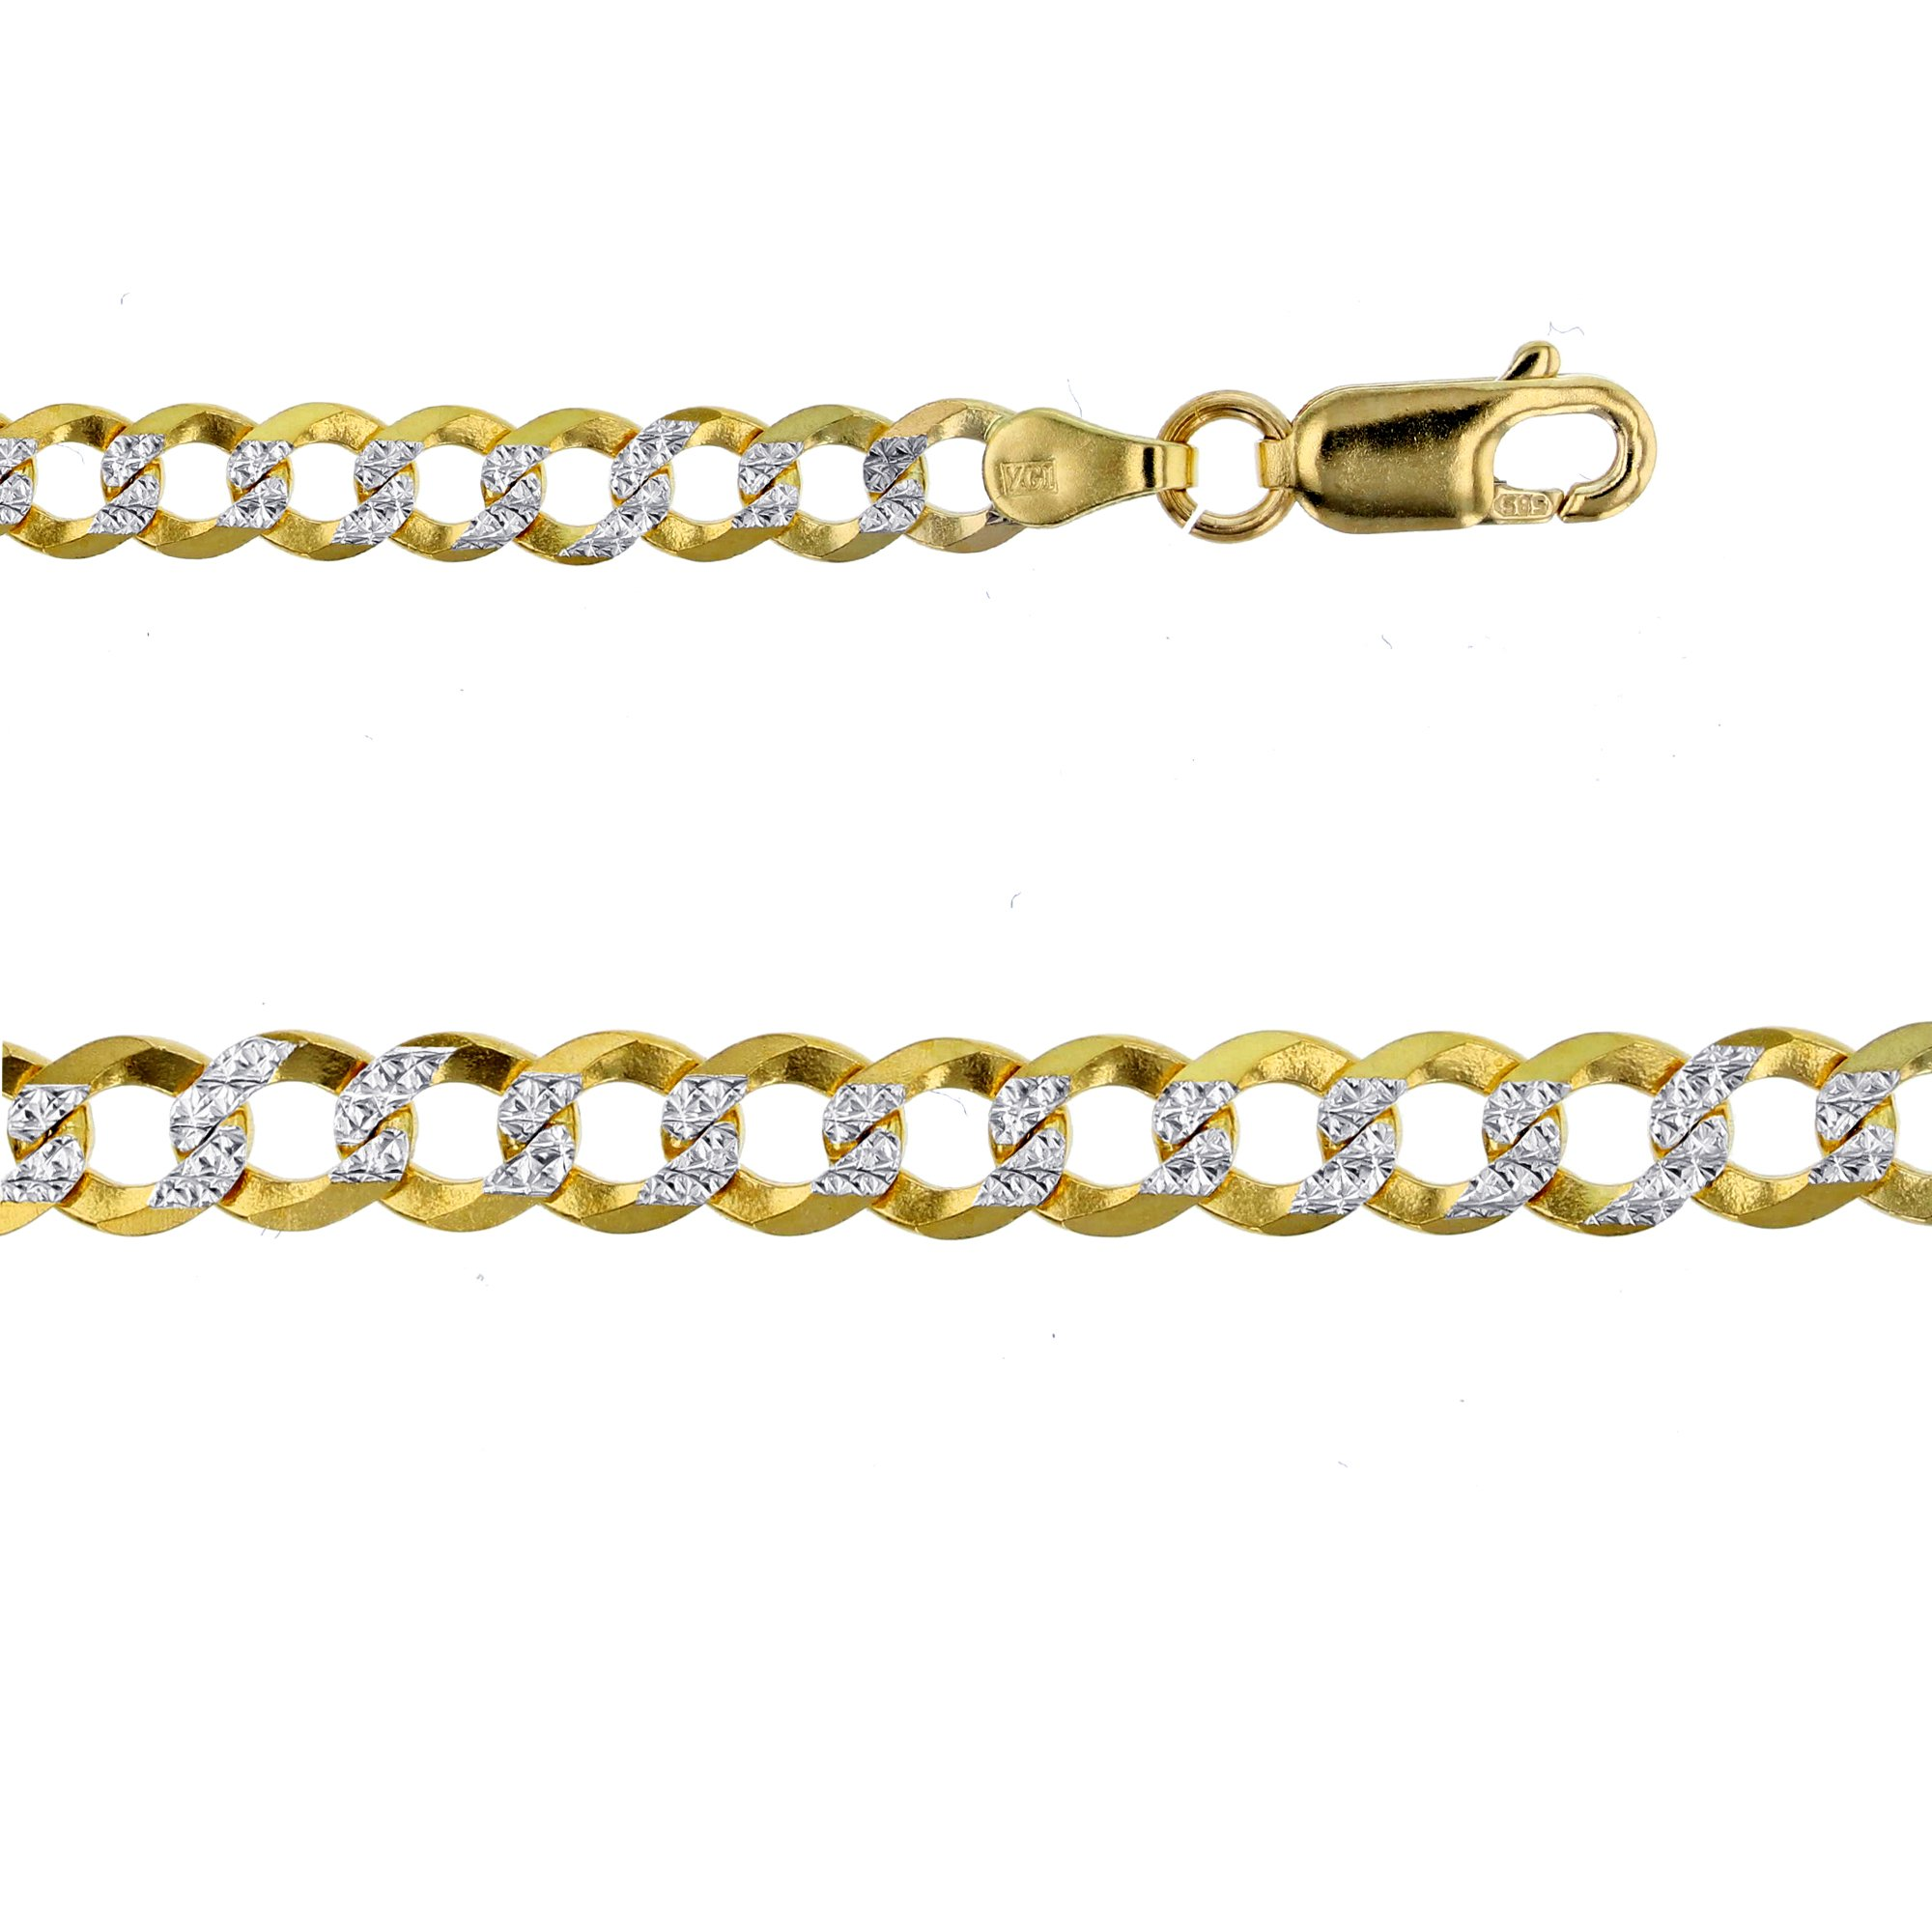 14K Gold Two Tone 4.65MM Cuban 120 8'' Bracelet